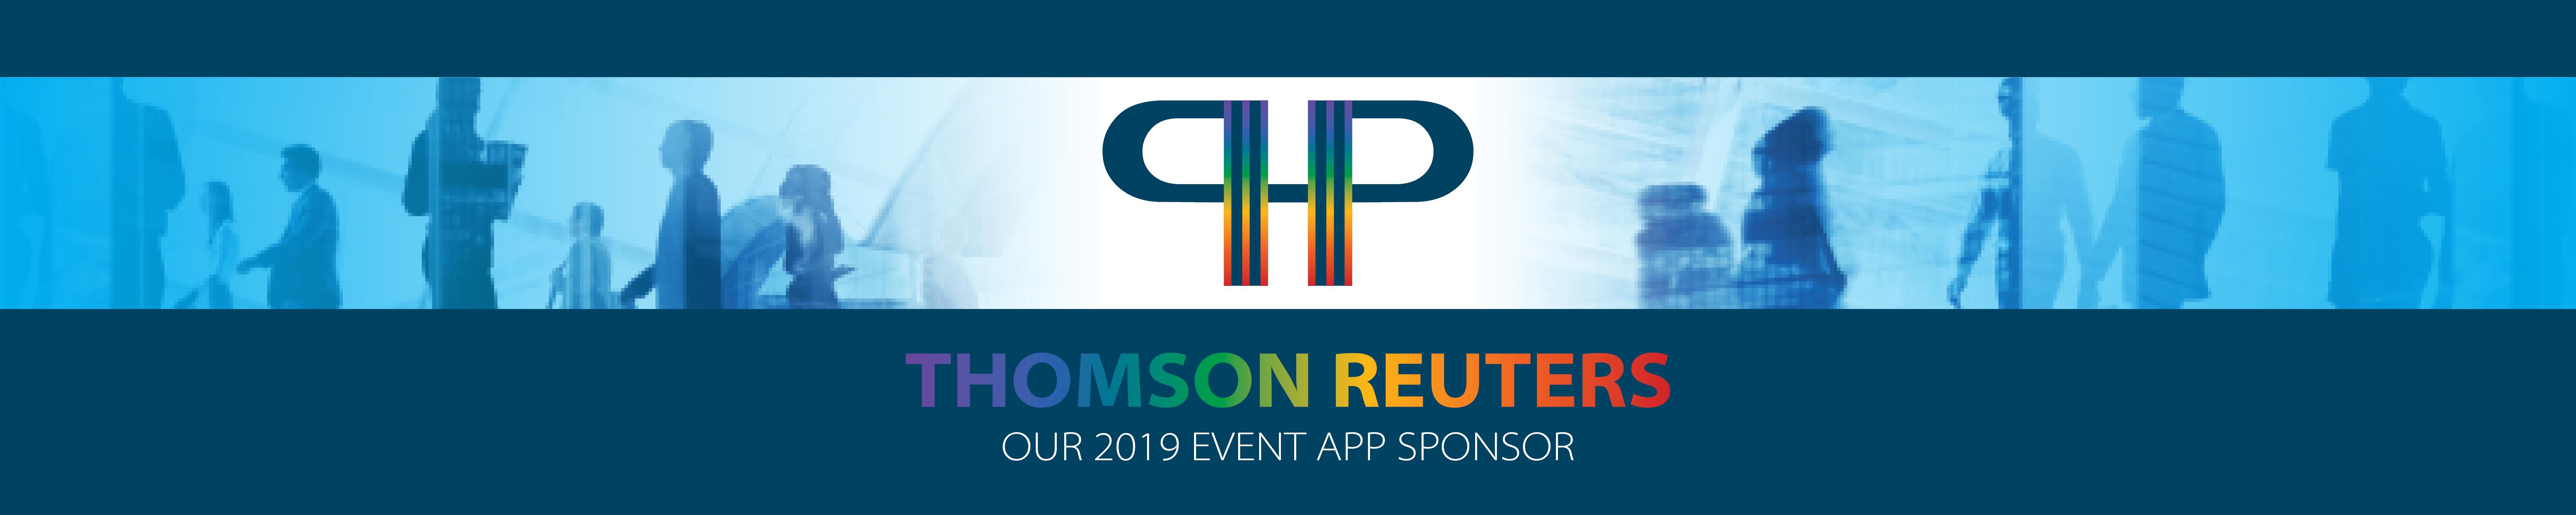 2019_PIP_ThomsonReuters